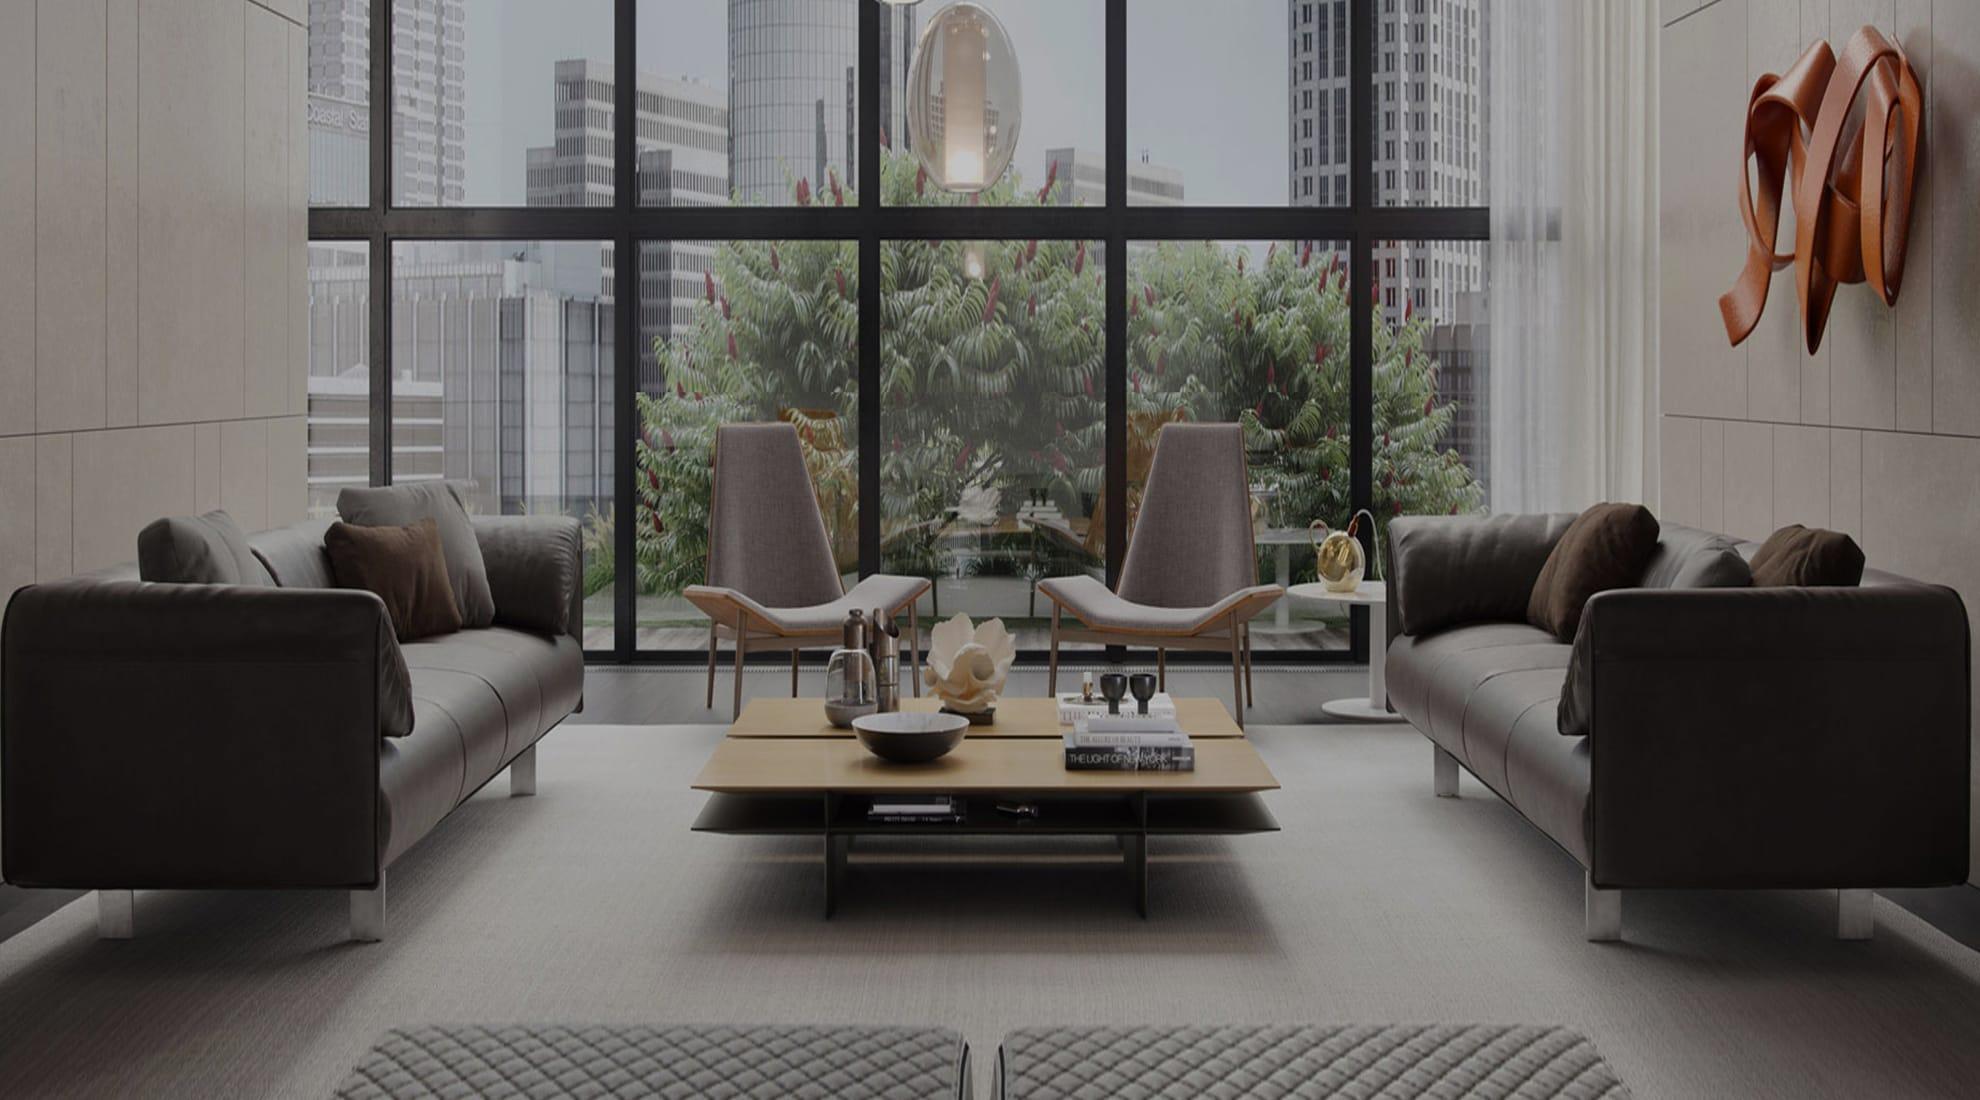 living room design tips small tv setup ideas 3 at lumens com for designing a get together ready